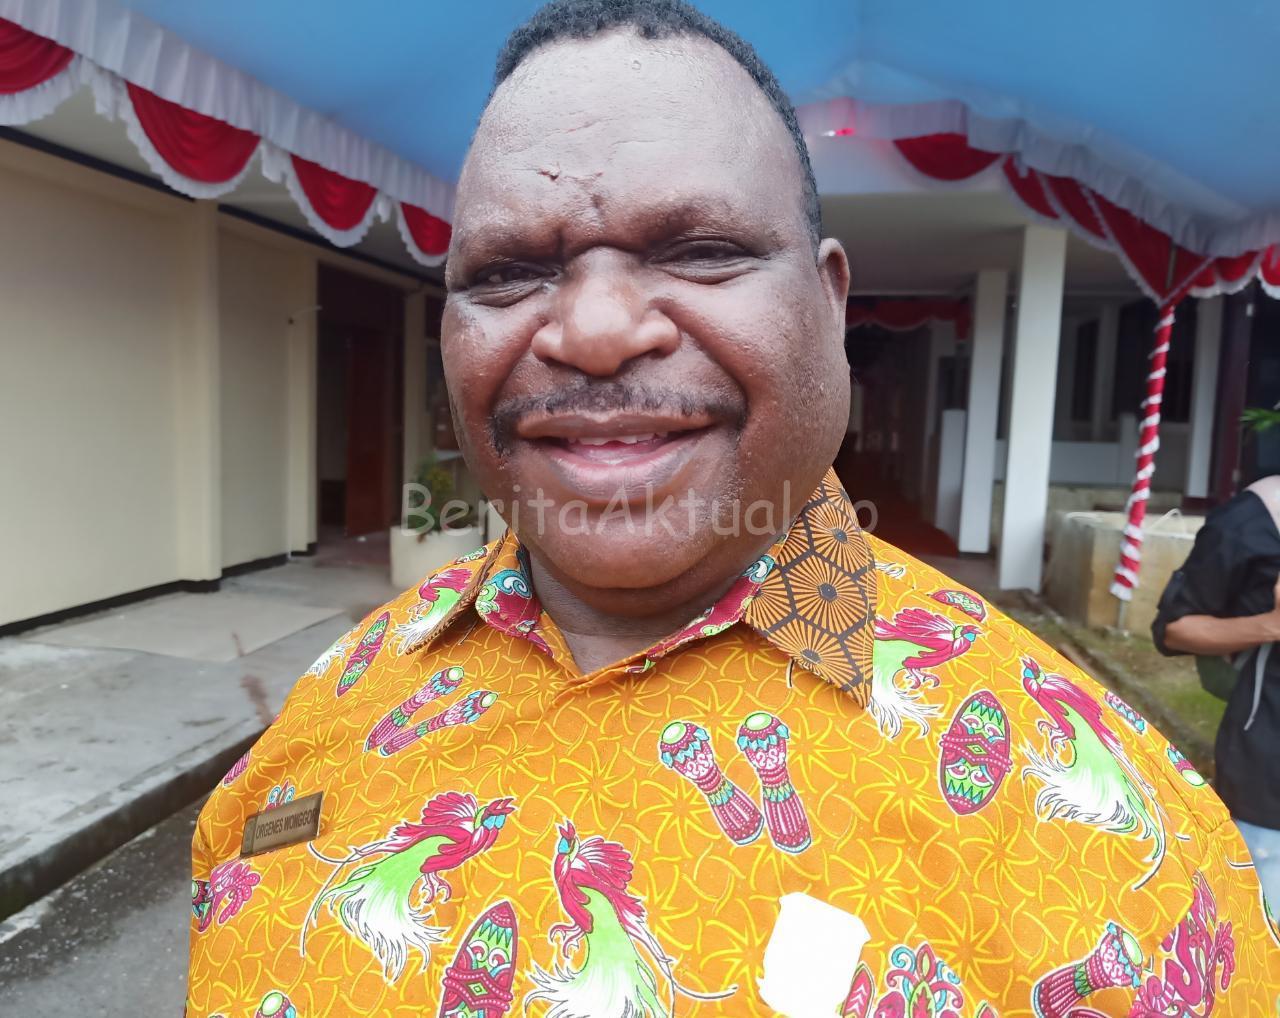 Ketua DPR Papua Barat Relokasi Anggaran Dewan Rp10,5 Miliar Cegah Covid-19 1 IMG 20200414 WA0078